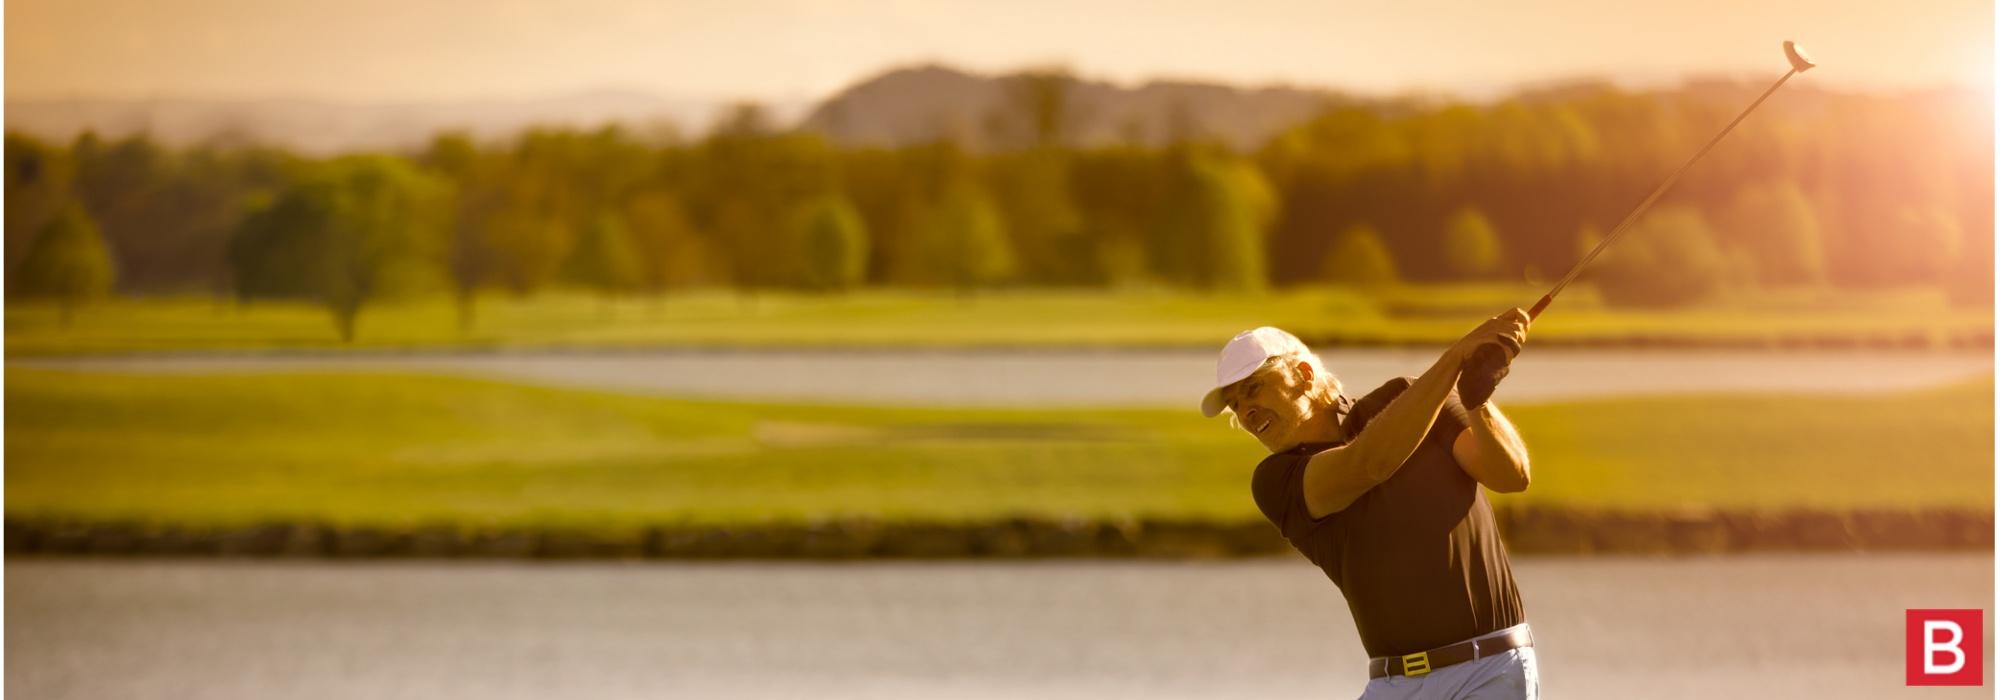 Health Benefits of Golf 2000x700.jpeg